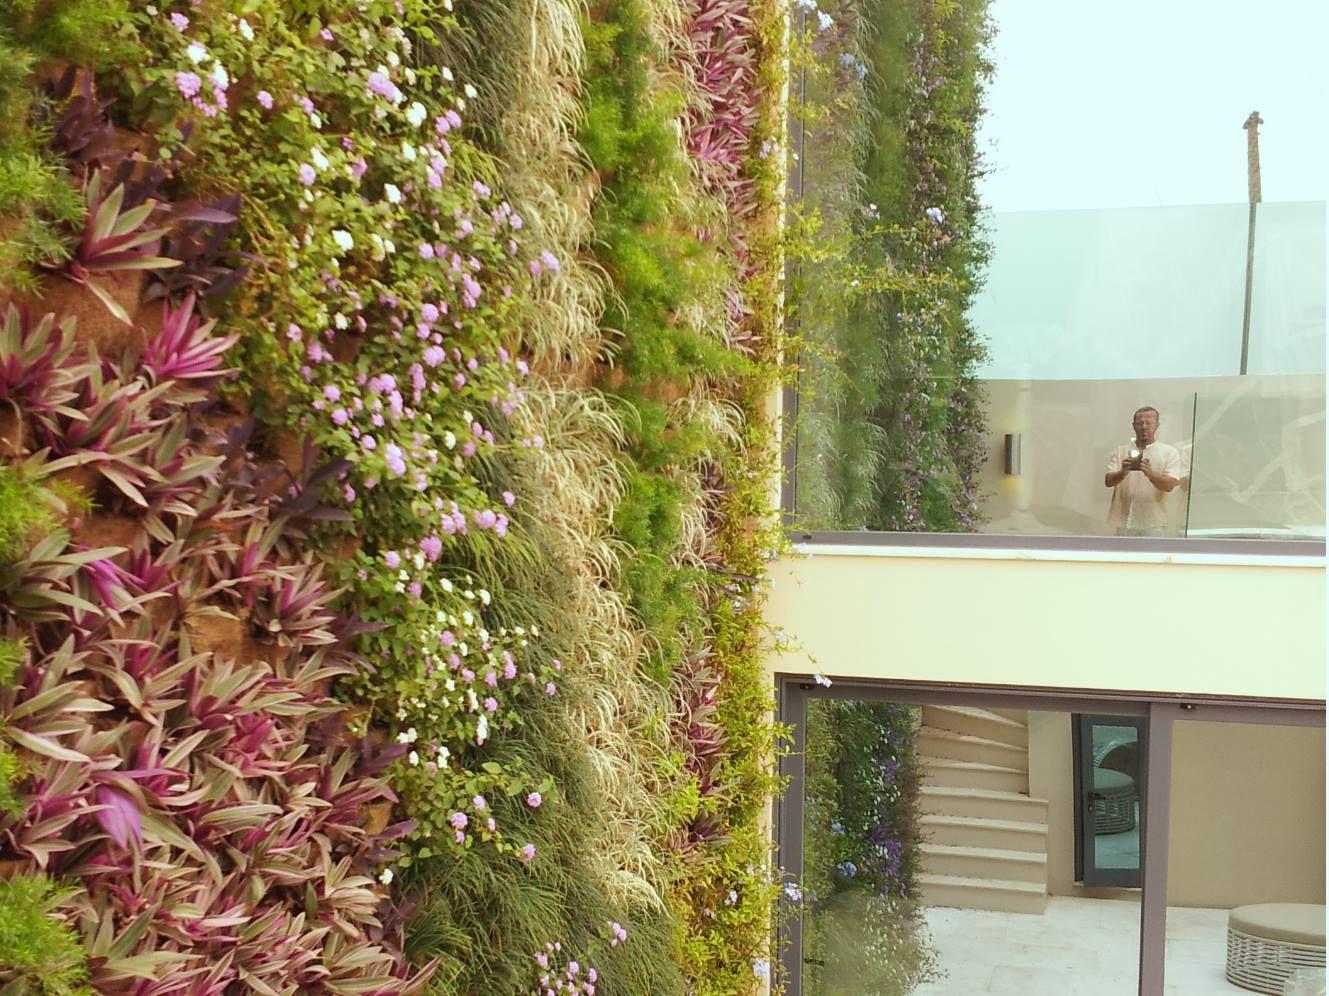 poliflor, luanda green wall, flexiverde vydro | Poliflor - giardini ...